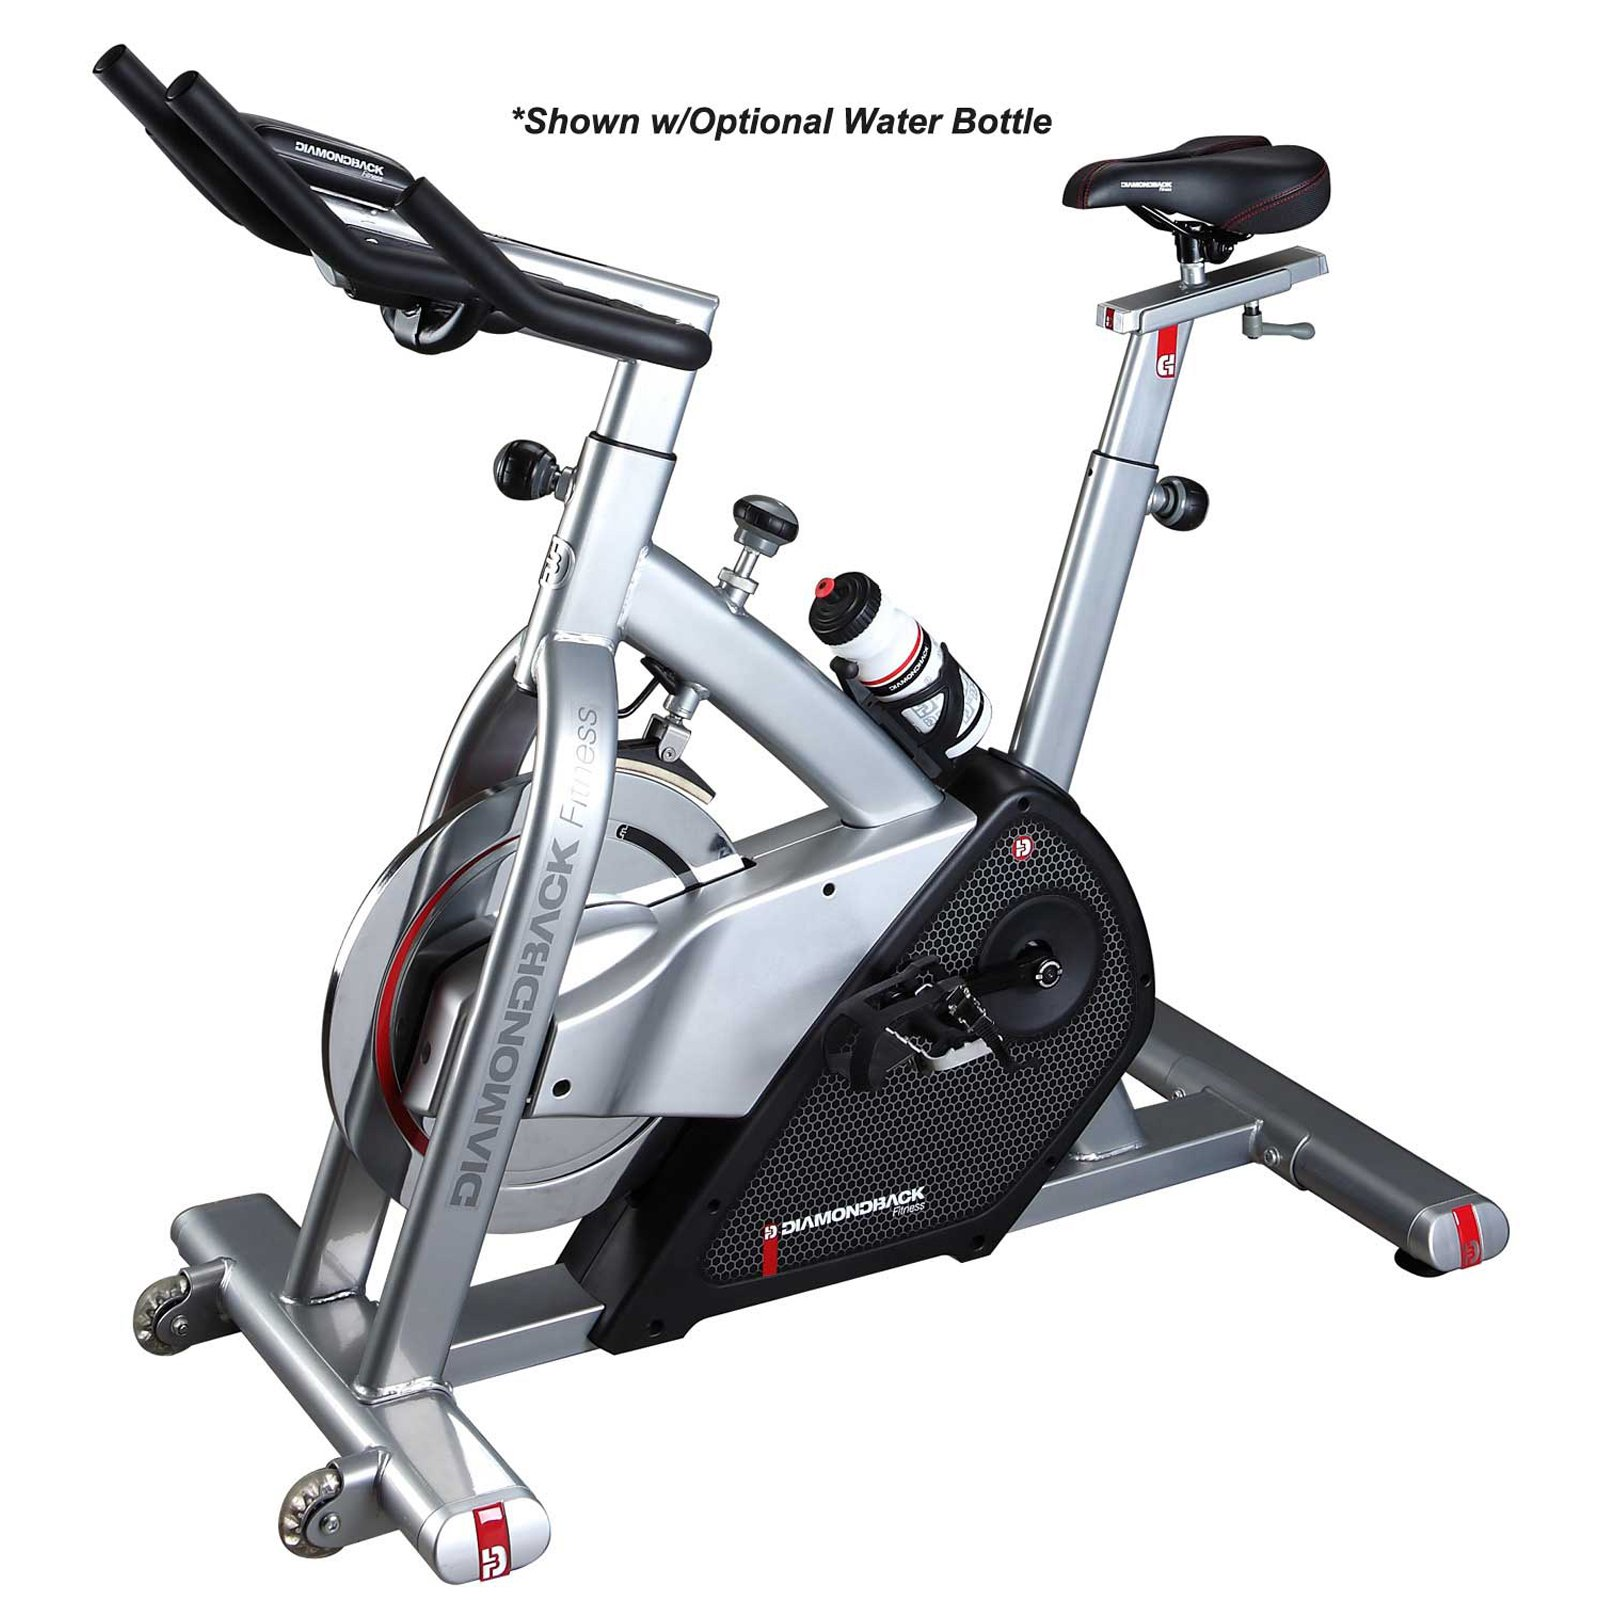 Diamondback Fitness 510Ic Adjustable Indoor Cycle with Electronic Display and Quiet Magnetic Flywheel by Diamondback Fitness